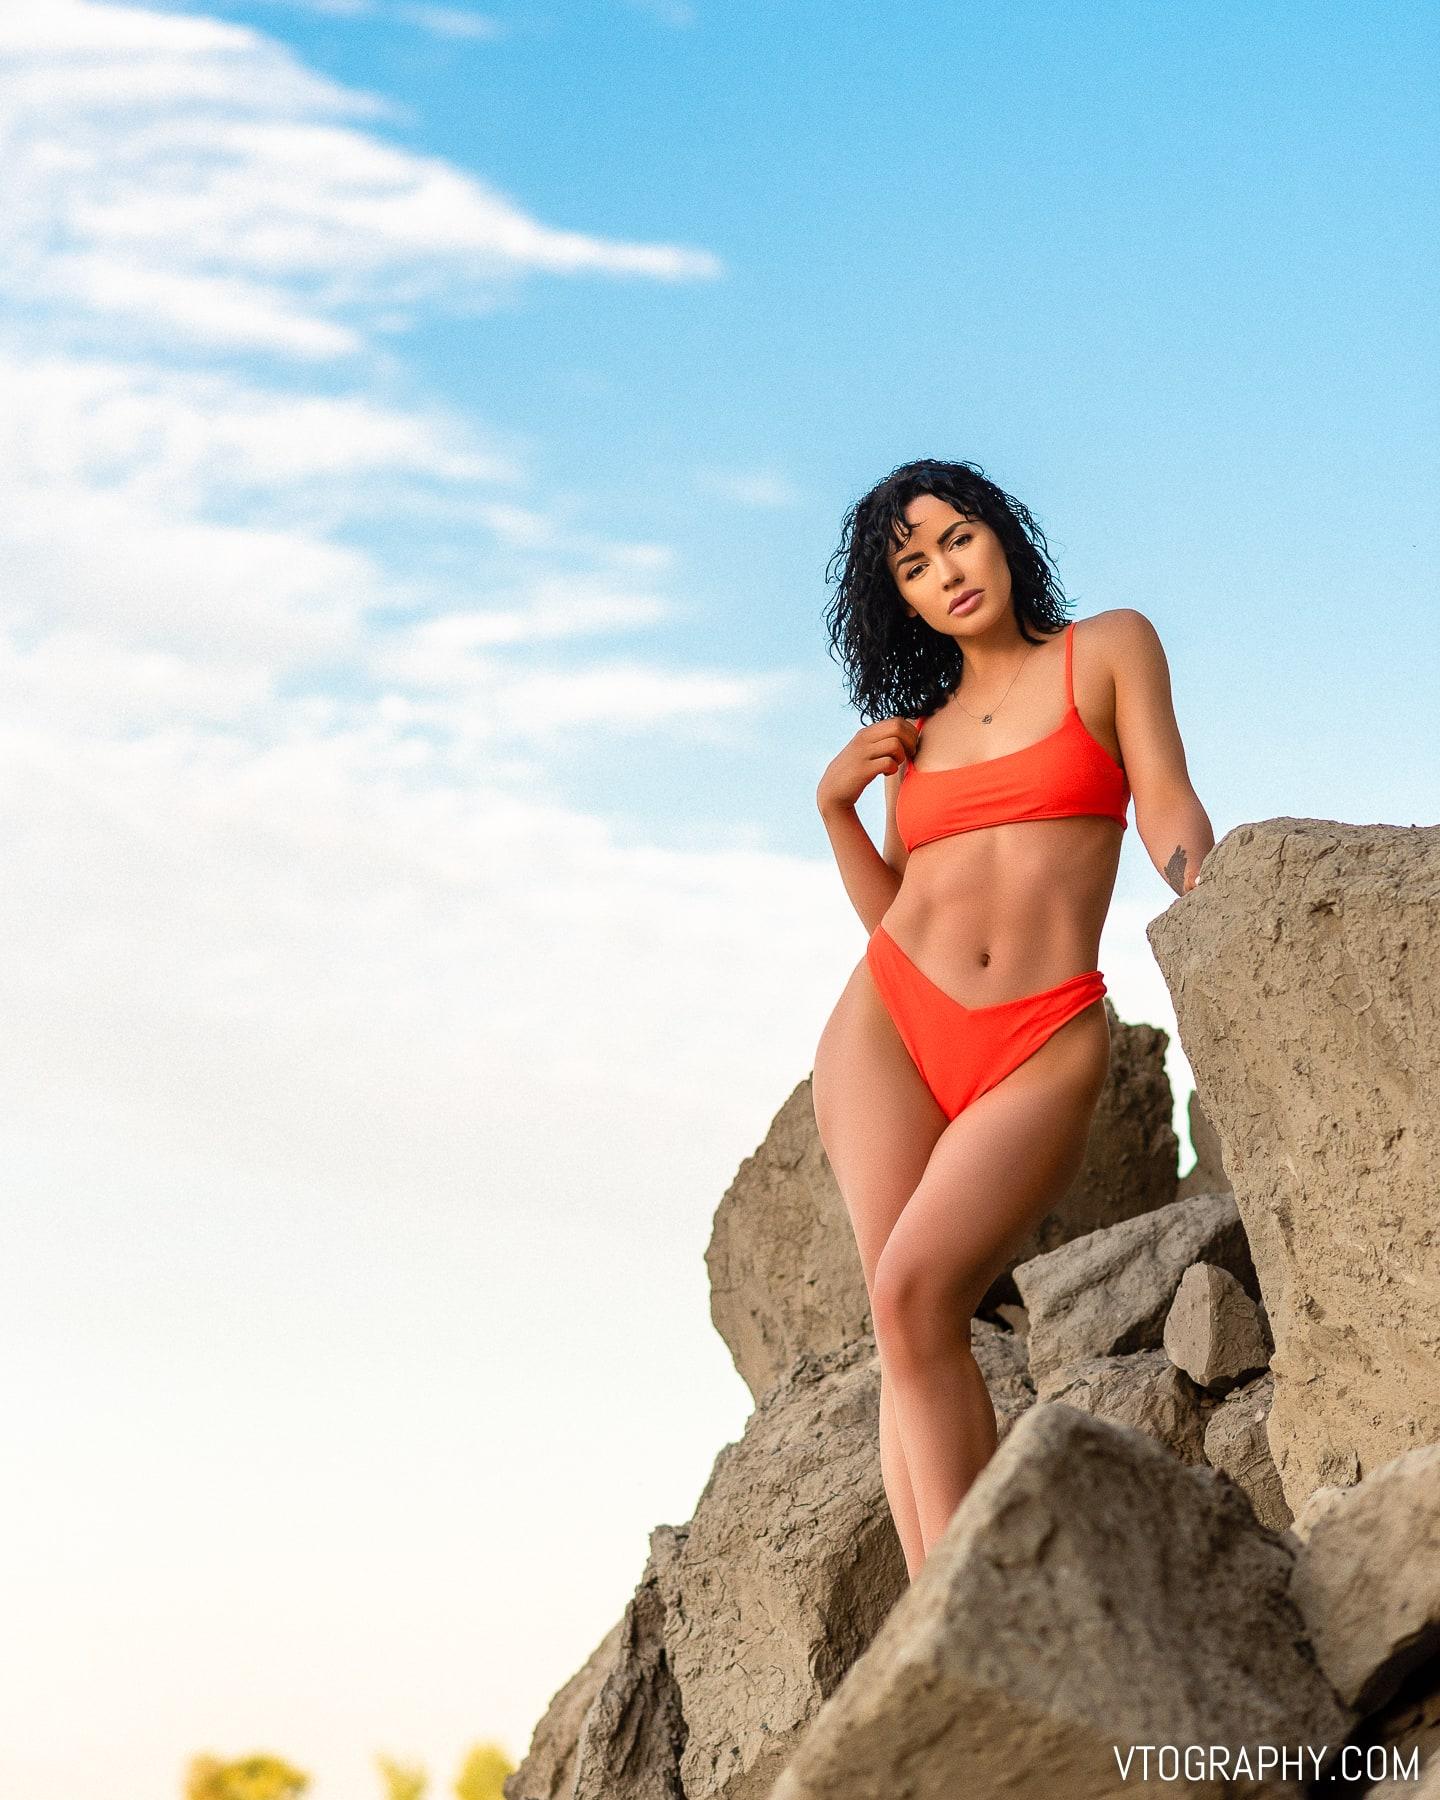 Scarborough Bluffs sunrise photo shoot with Ashley Drew wearing orange bikini